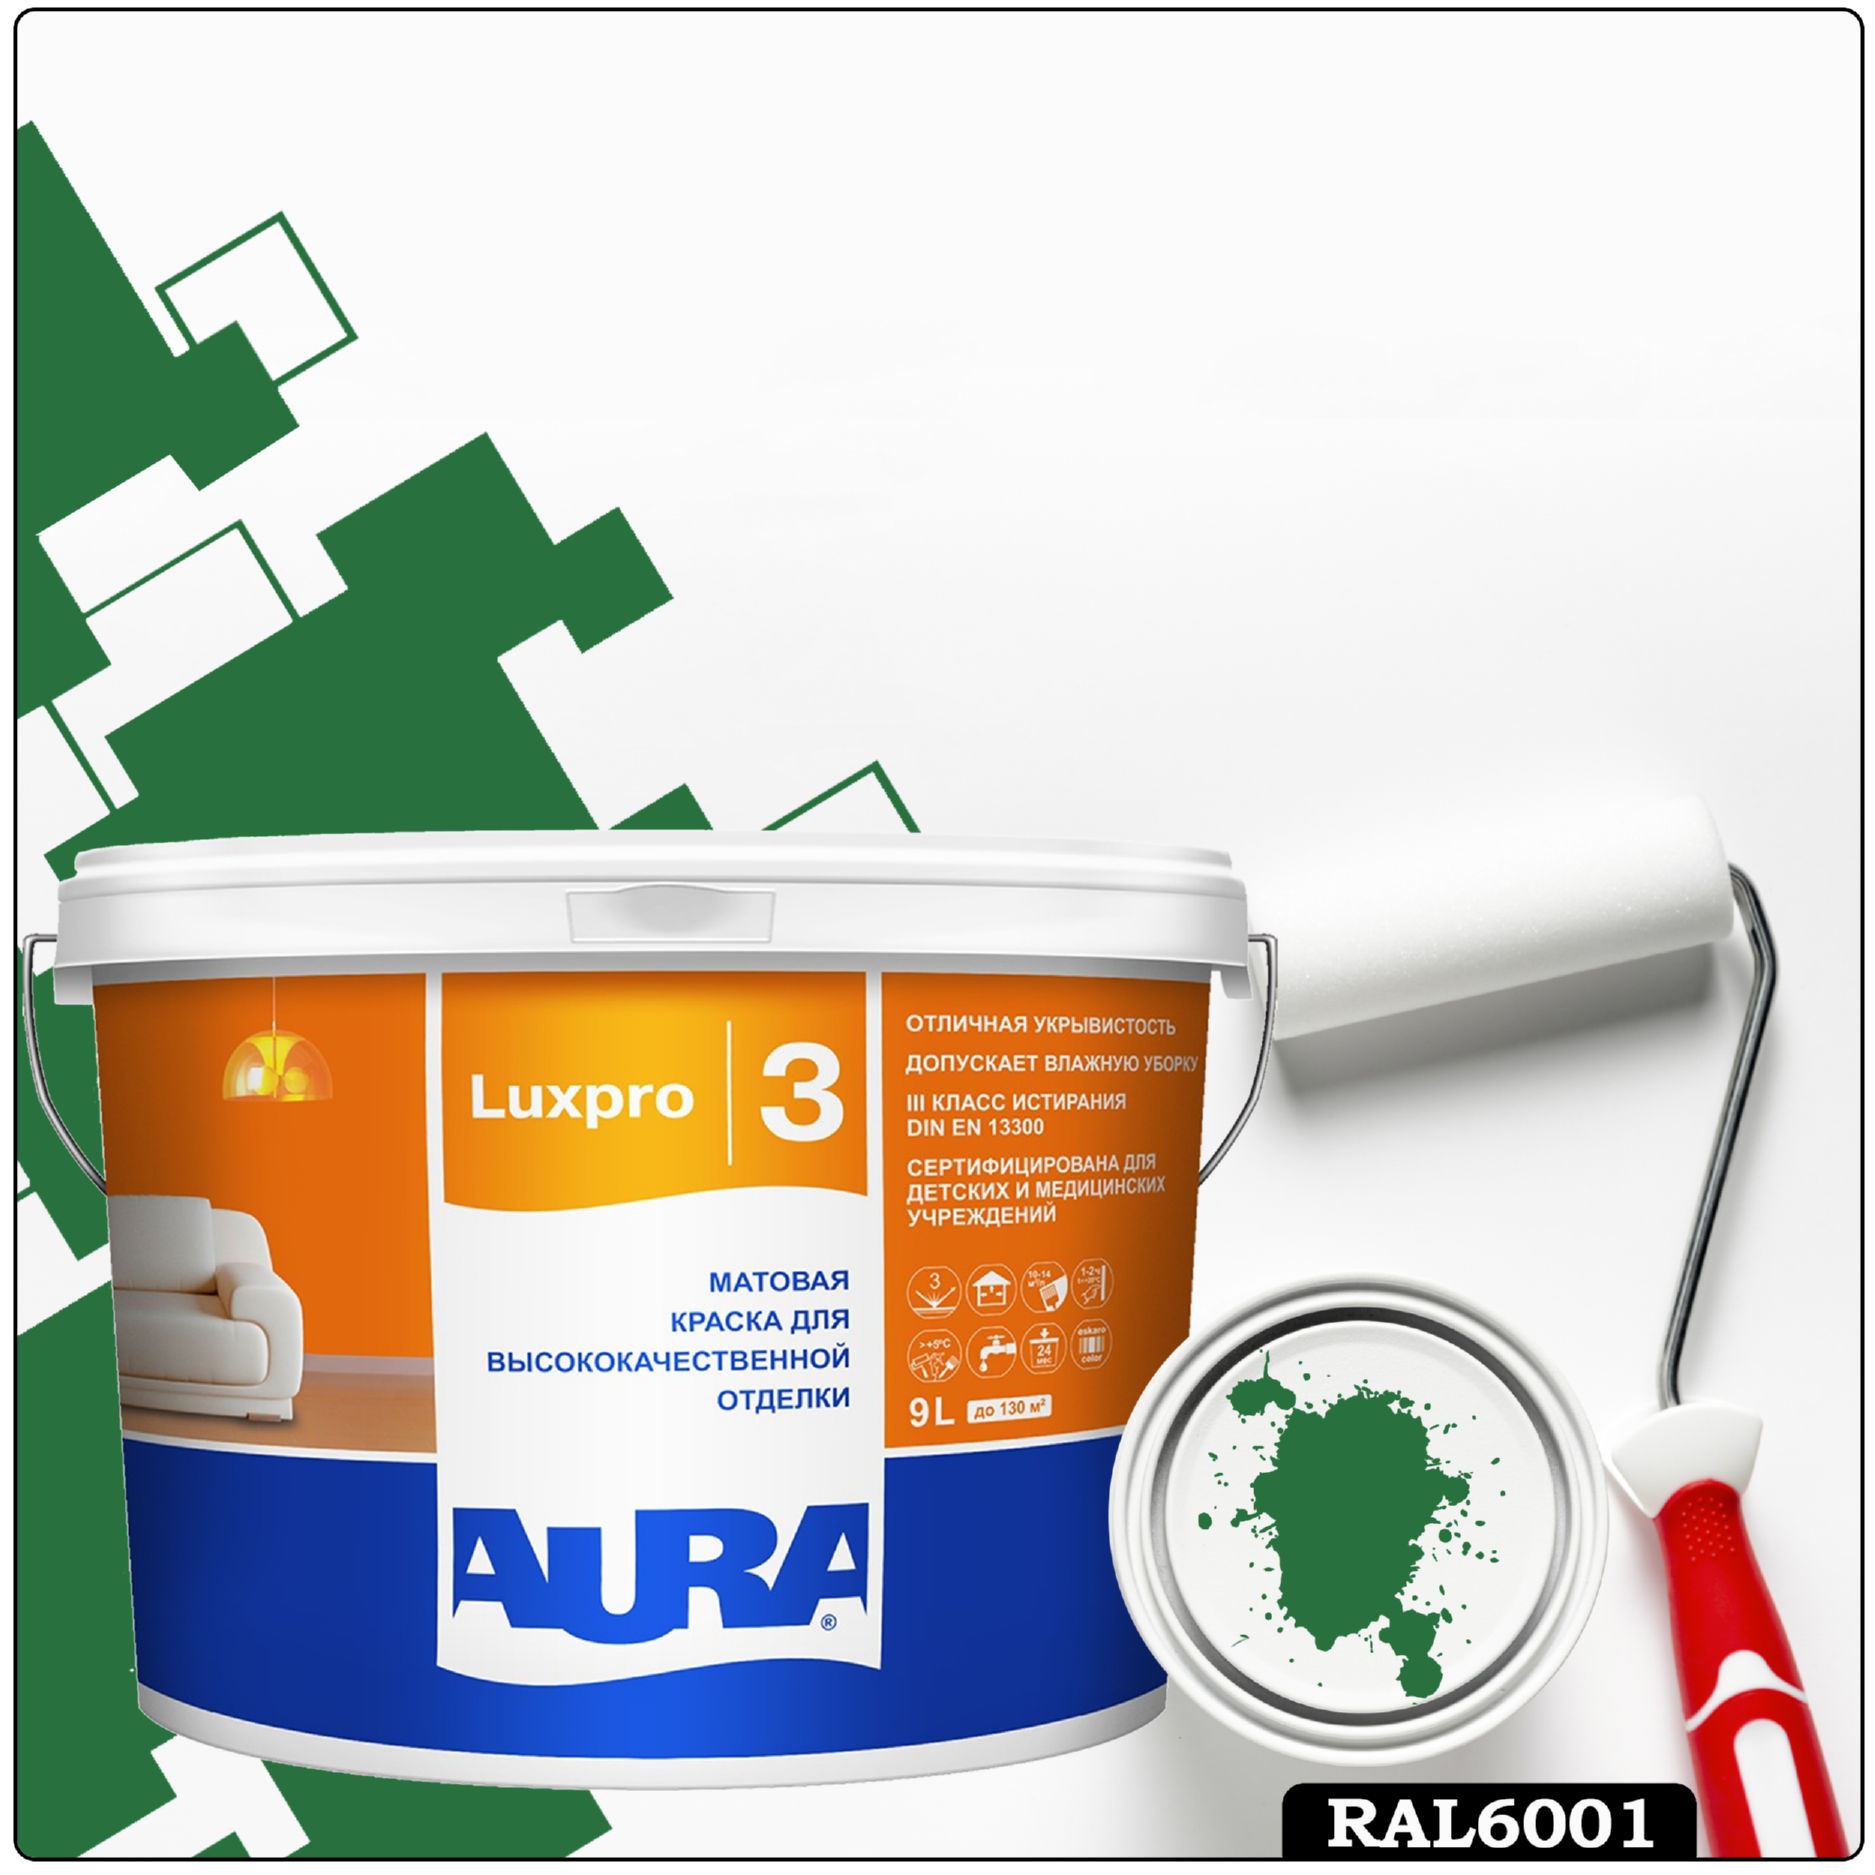 Фото 2 - Краска Aura LuxPRO 3, RAL 6001 Зеленый изумруд, латексная, шелково-матовая, интерьерная, 9л, Аура.